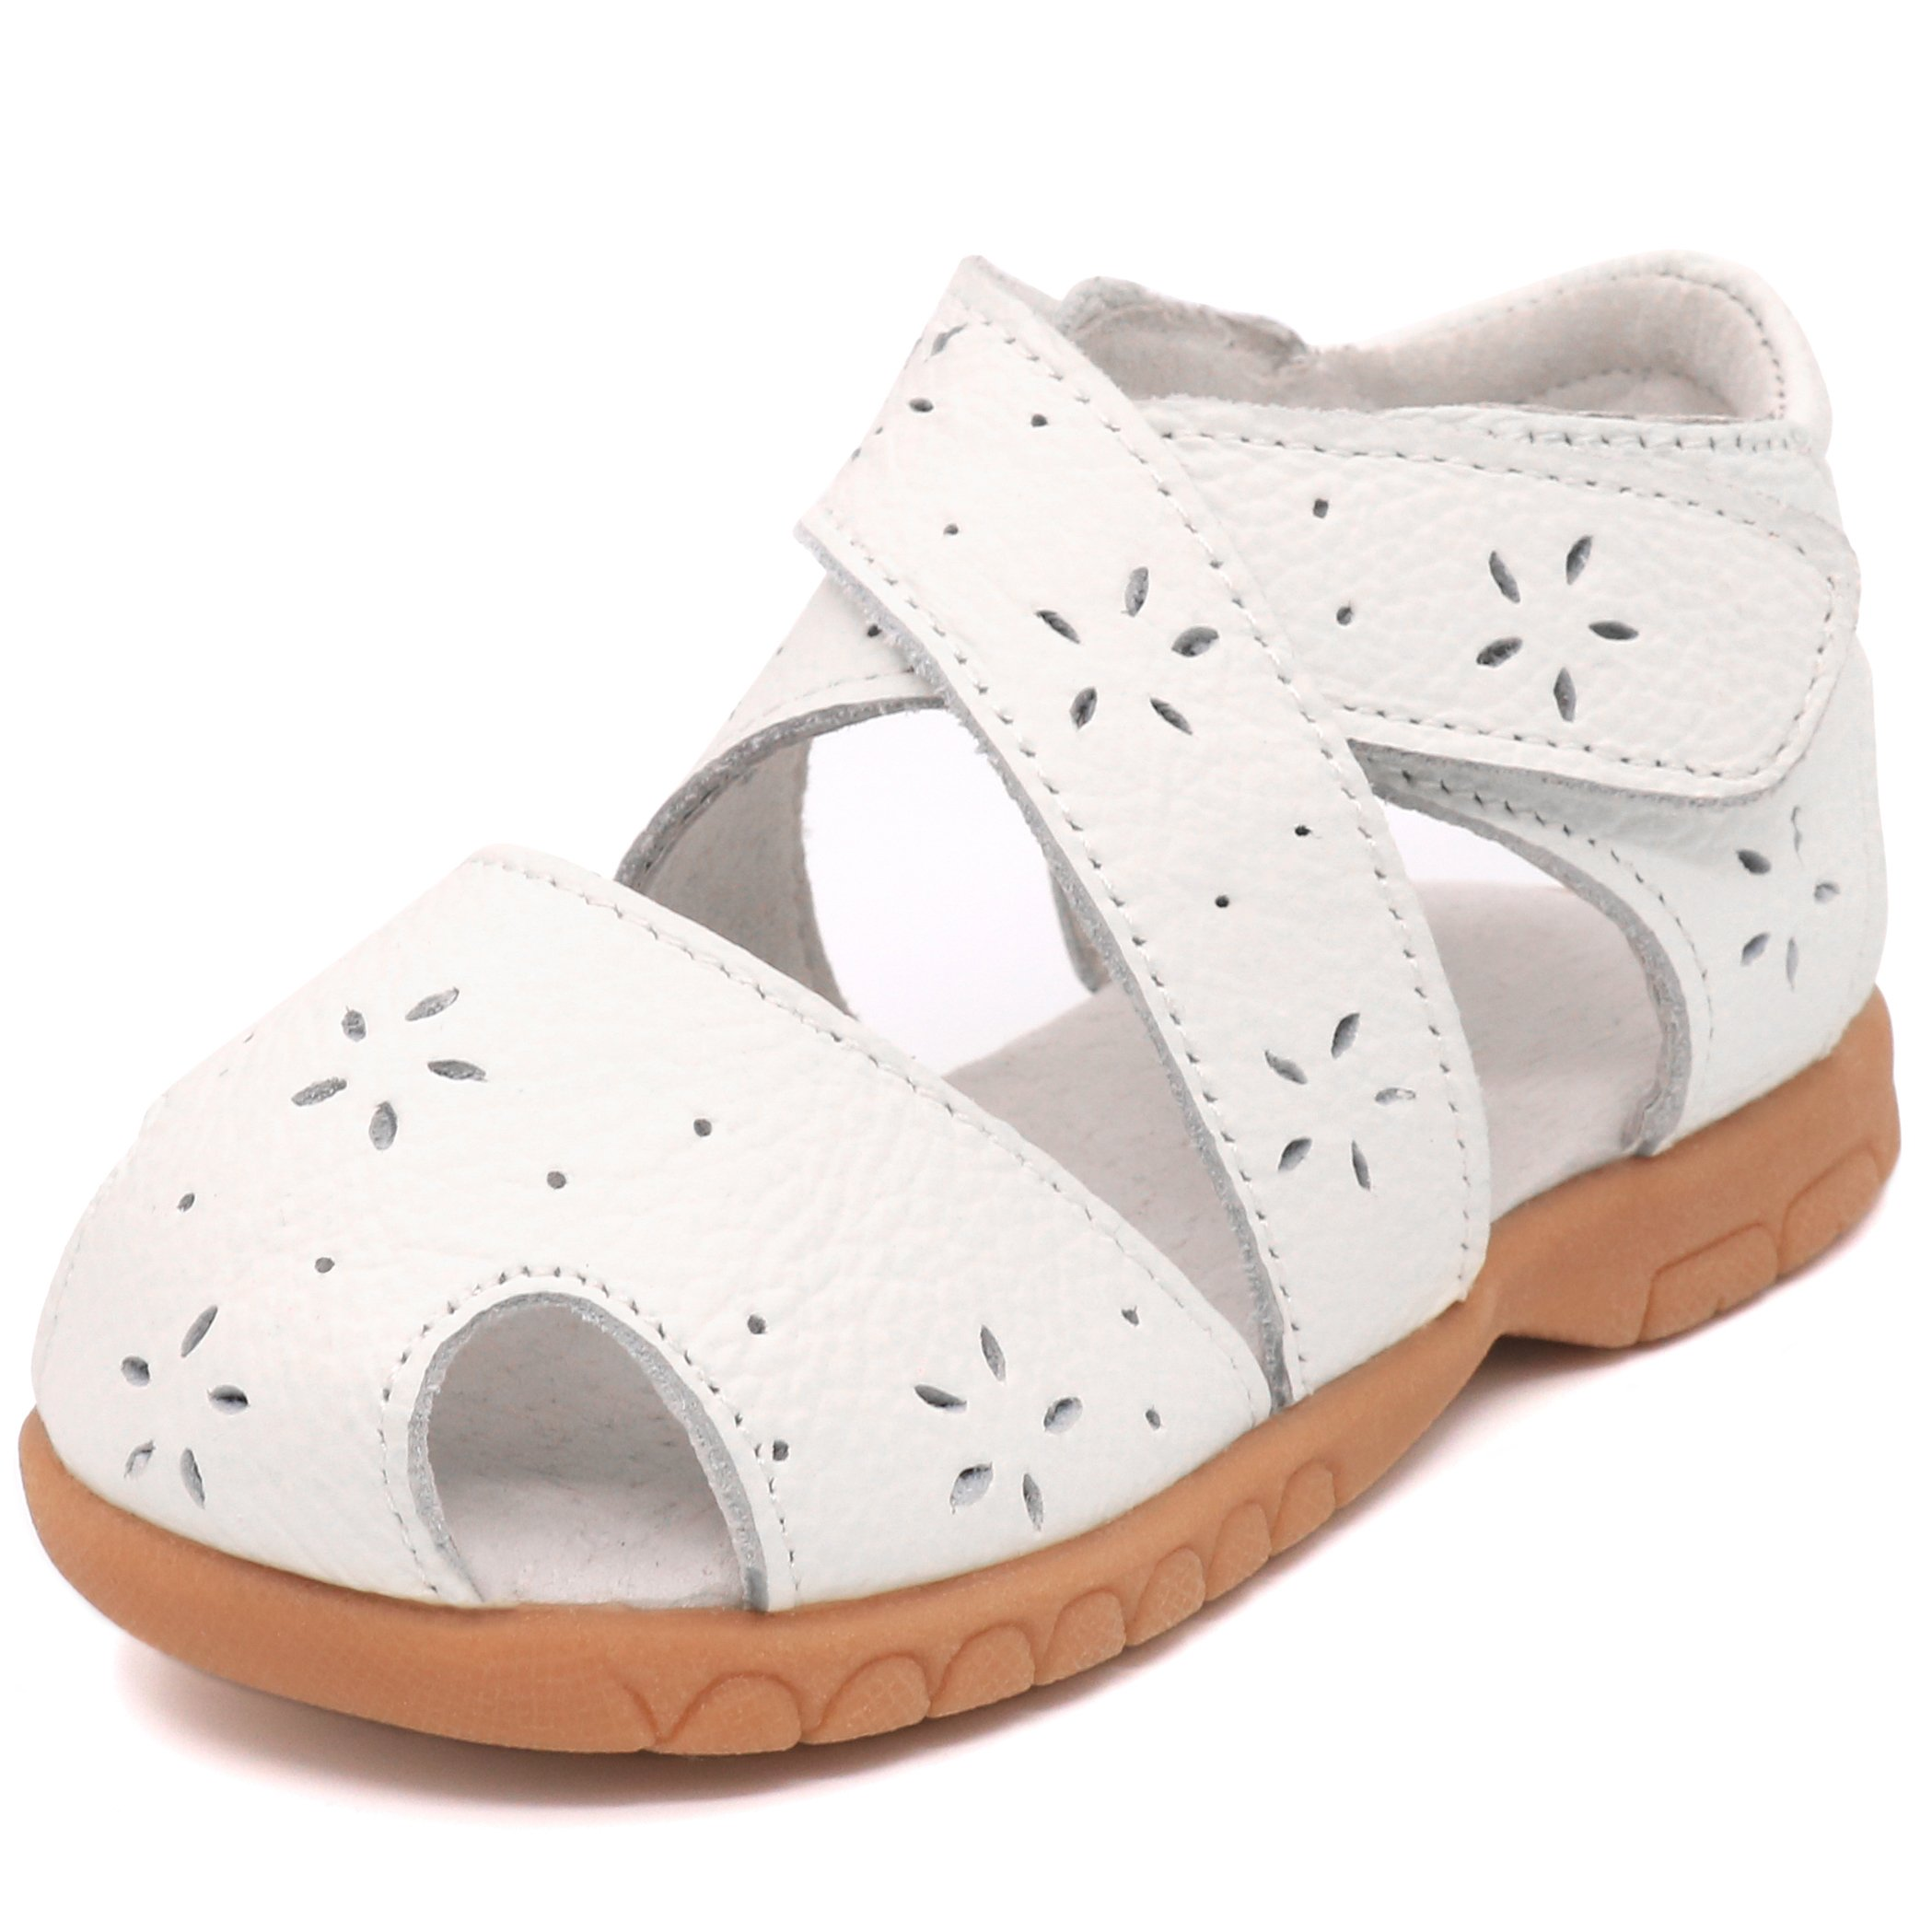 Femizee Toddler Girls Leather Closed Toe Gladiator Sandals,White,1534 CN22